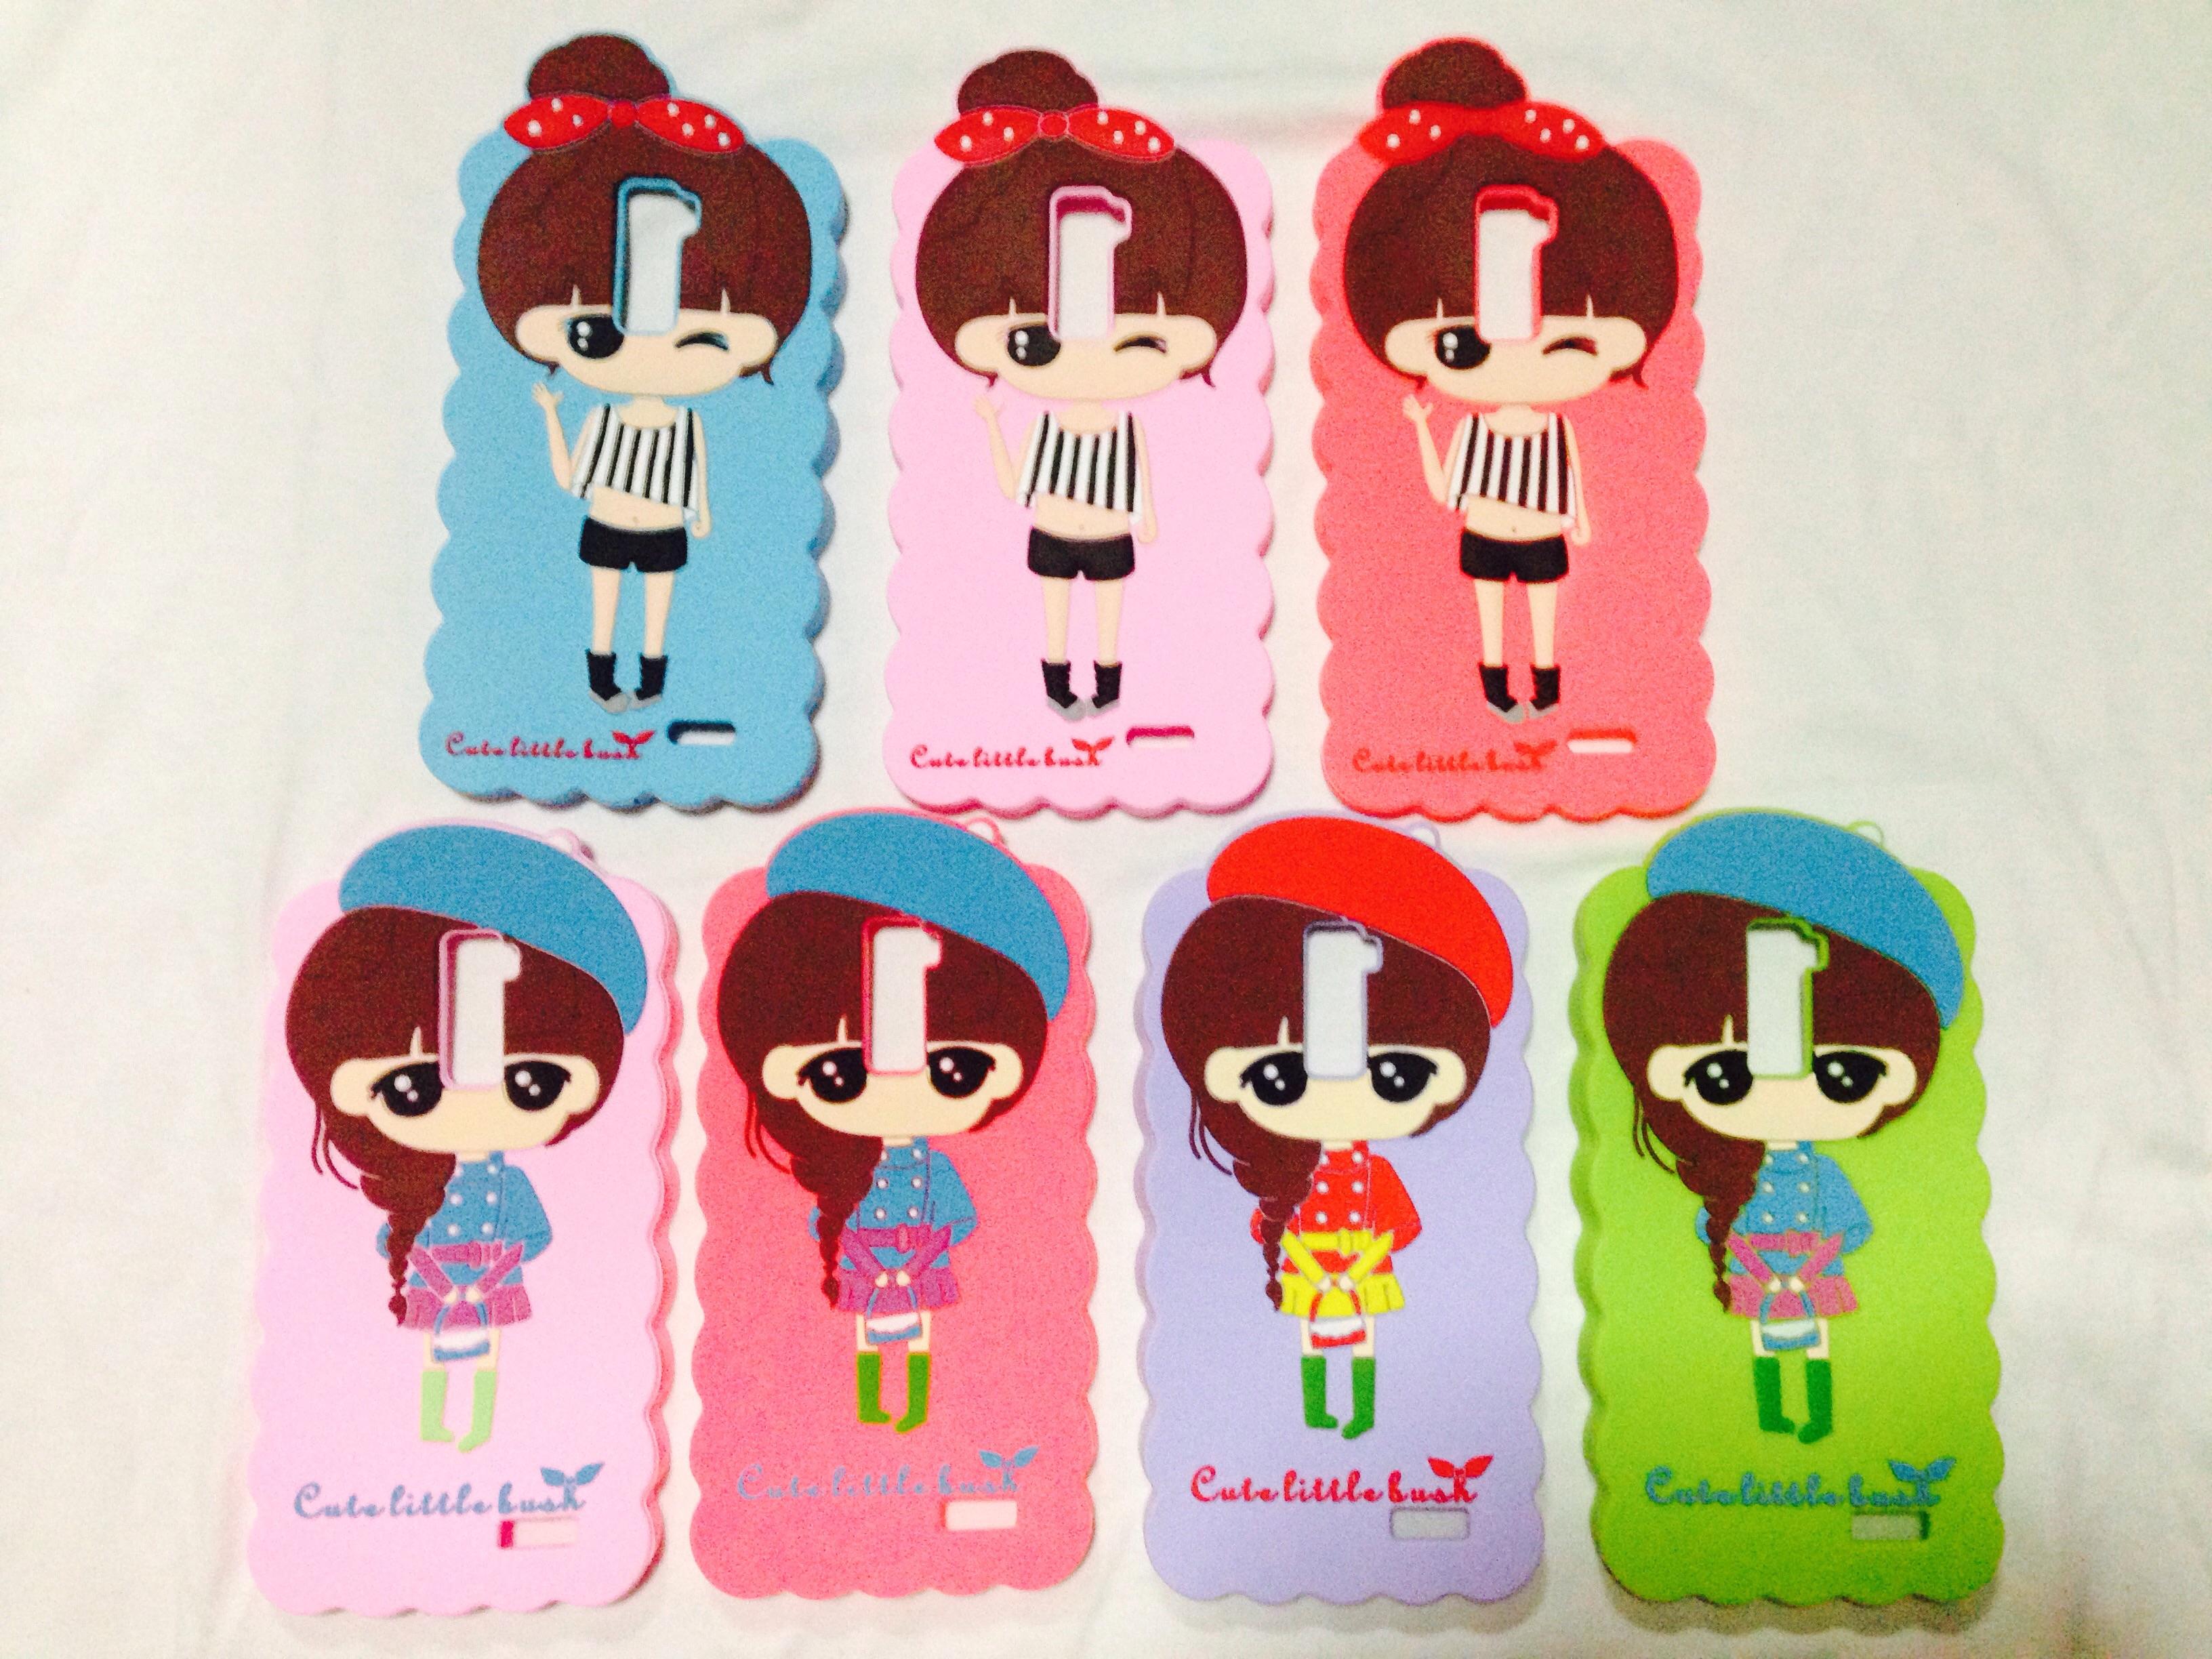 Case R7 plus รุ่น Cute Girl